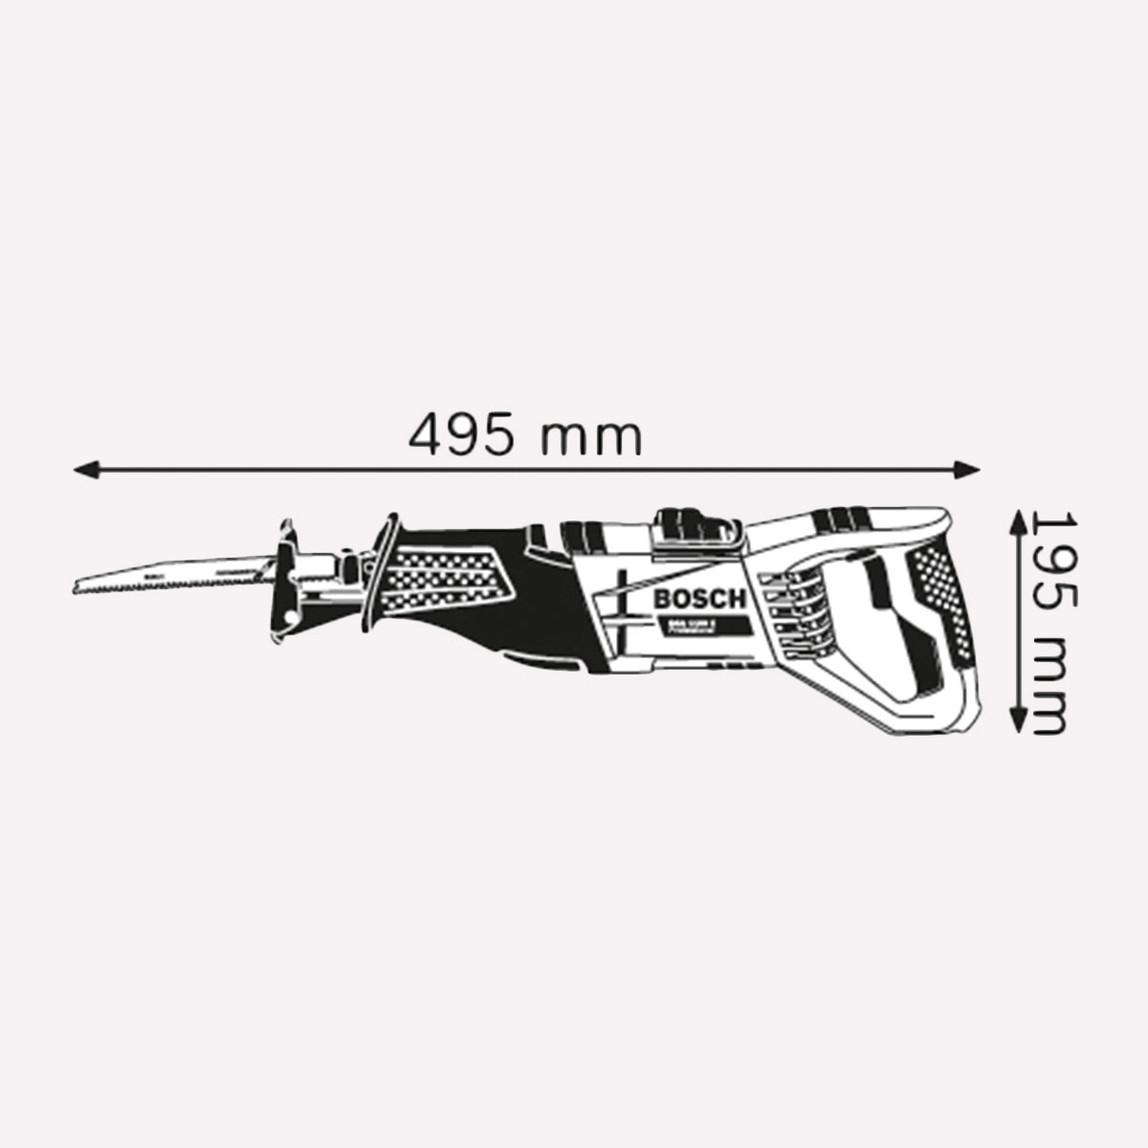 Bosch GSA1100E Profesyonel 1100W Tilki Kuyruğu Testere